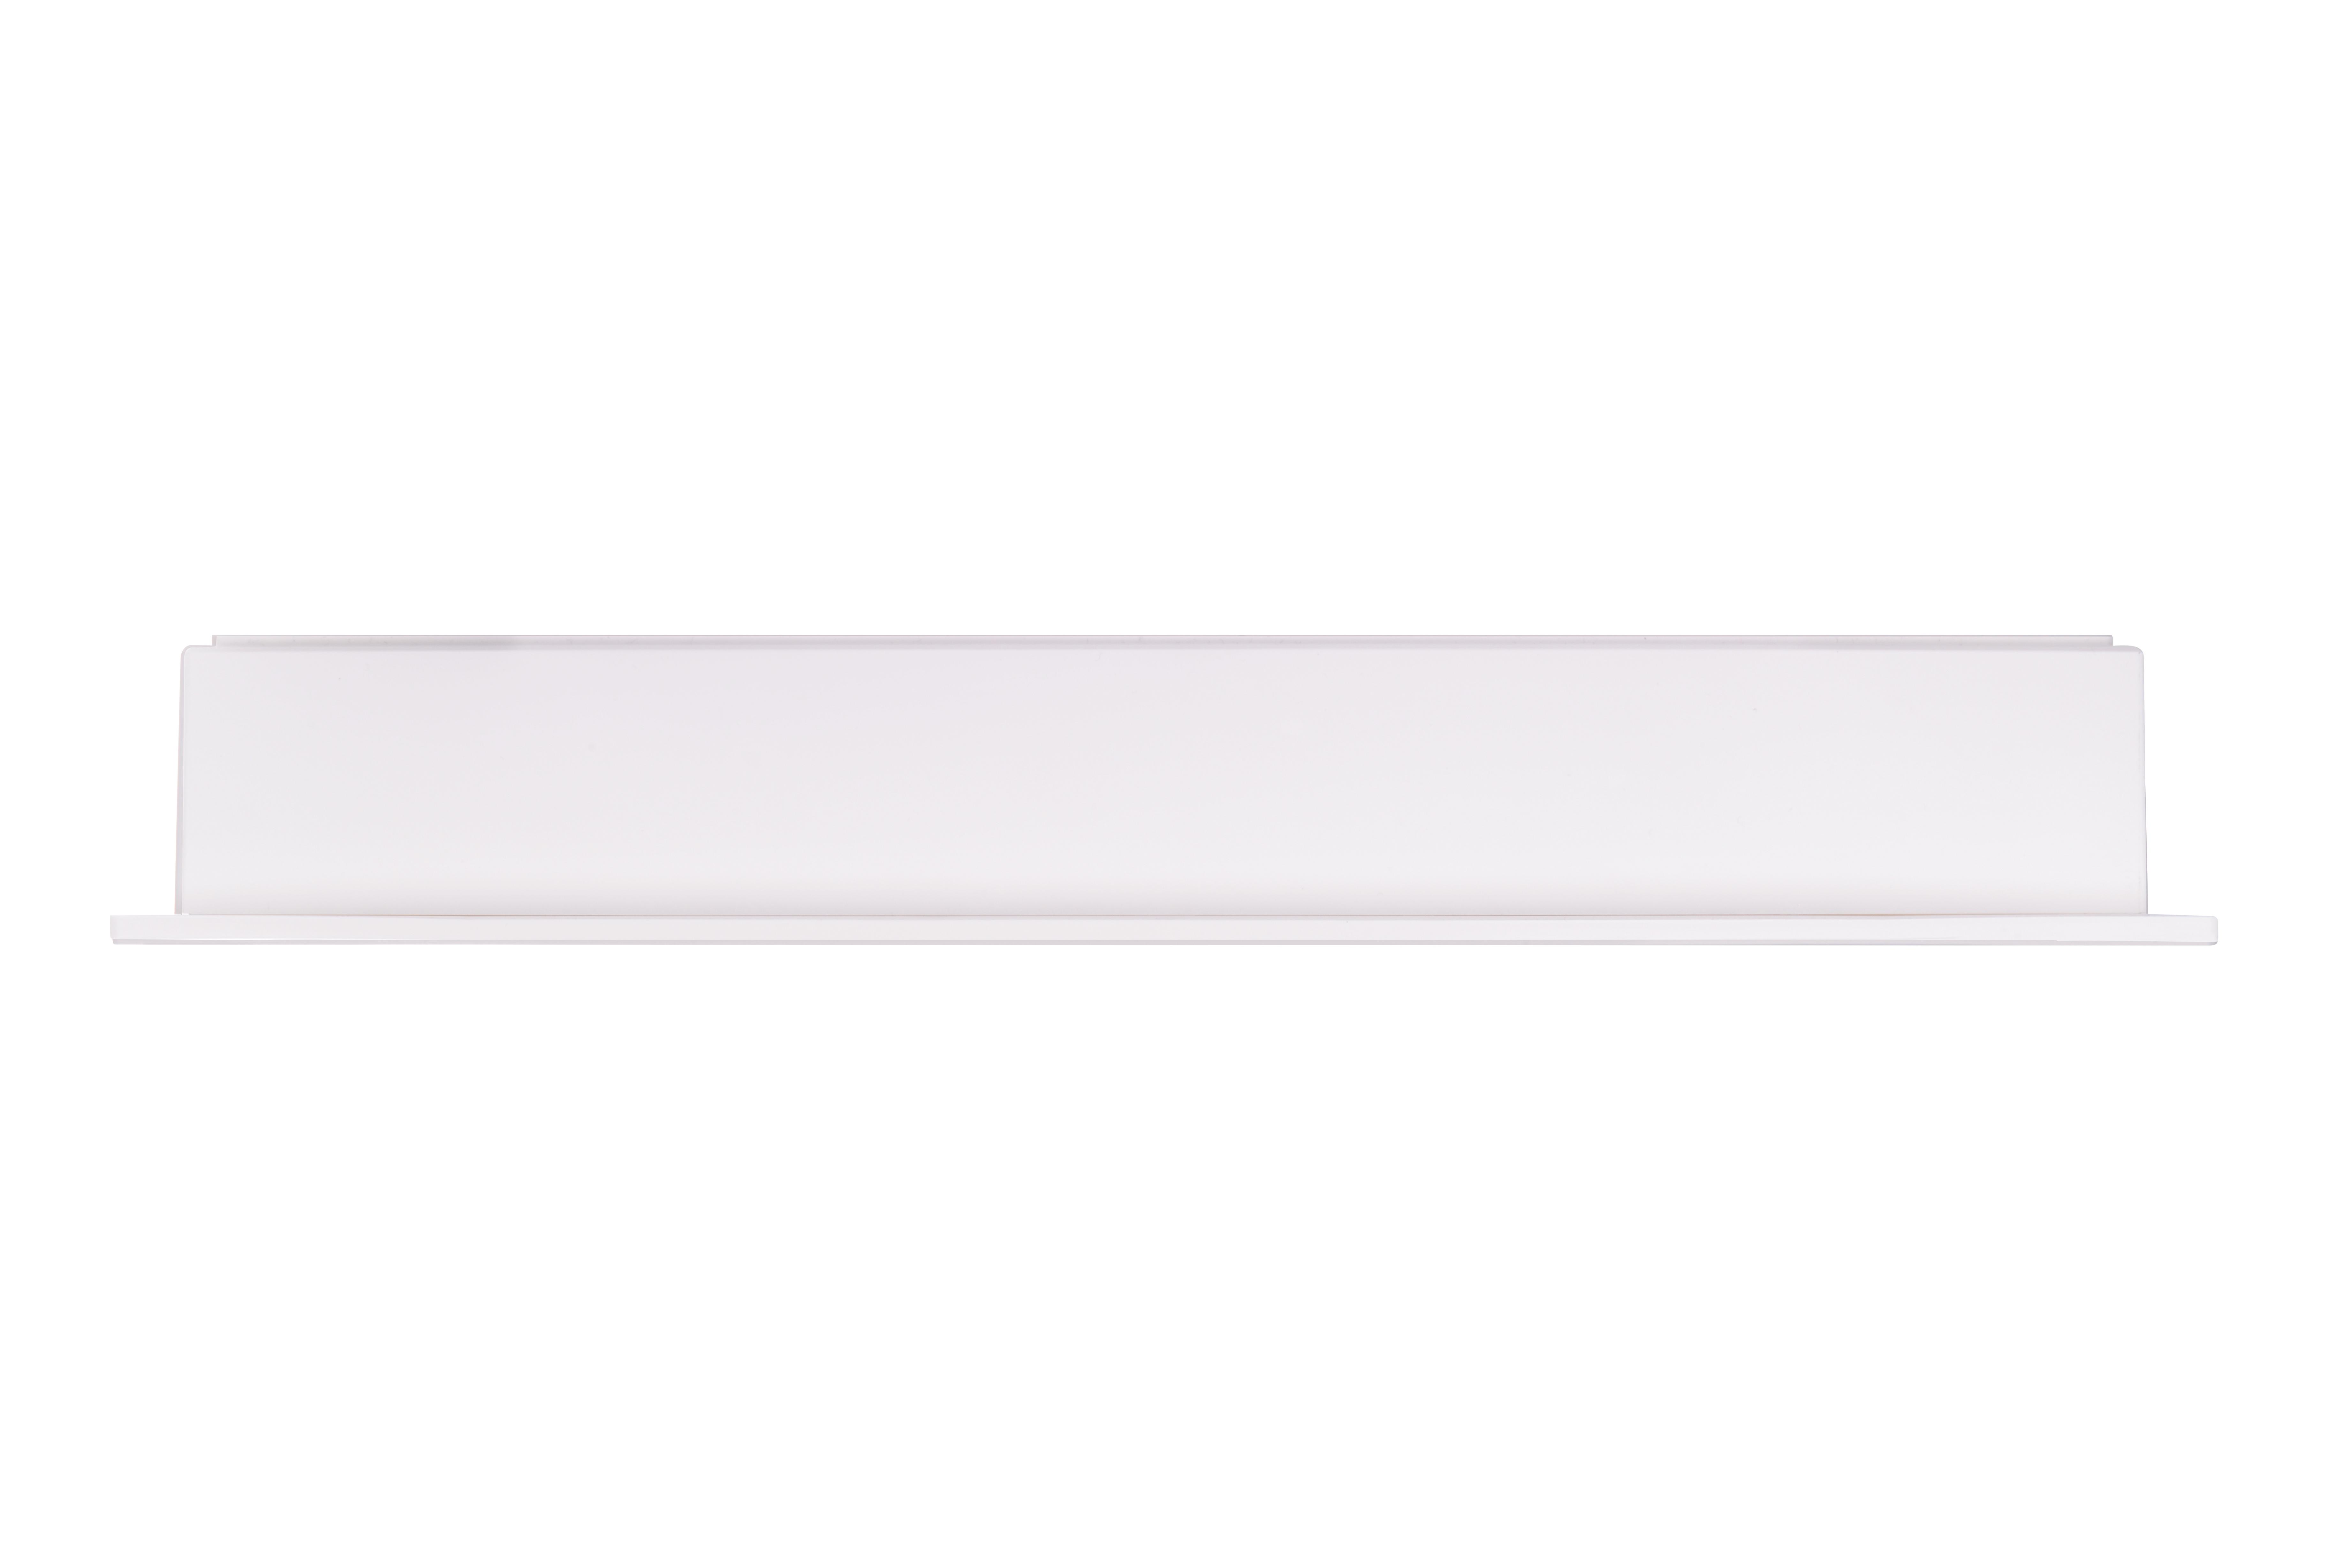 Lampa emergenta led Intelight 94706   3h mentinut test automat 5